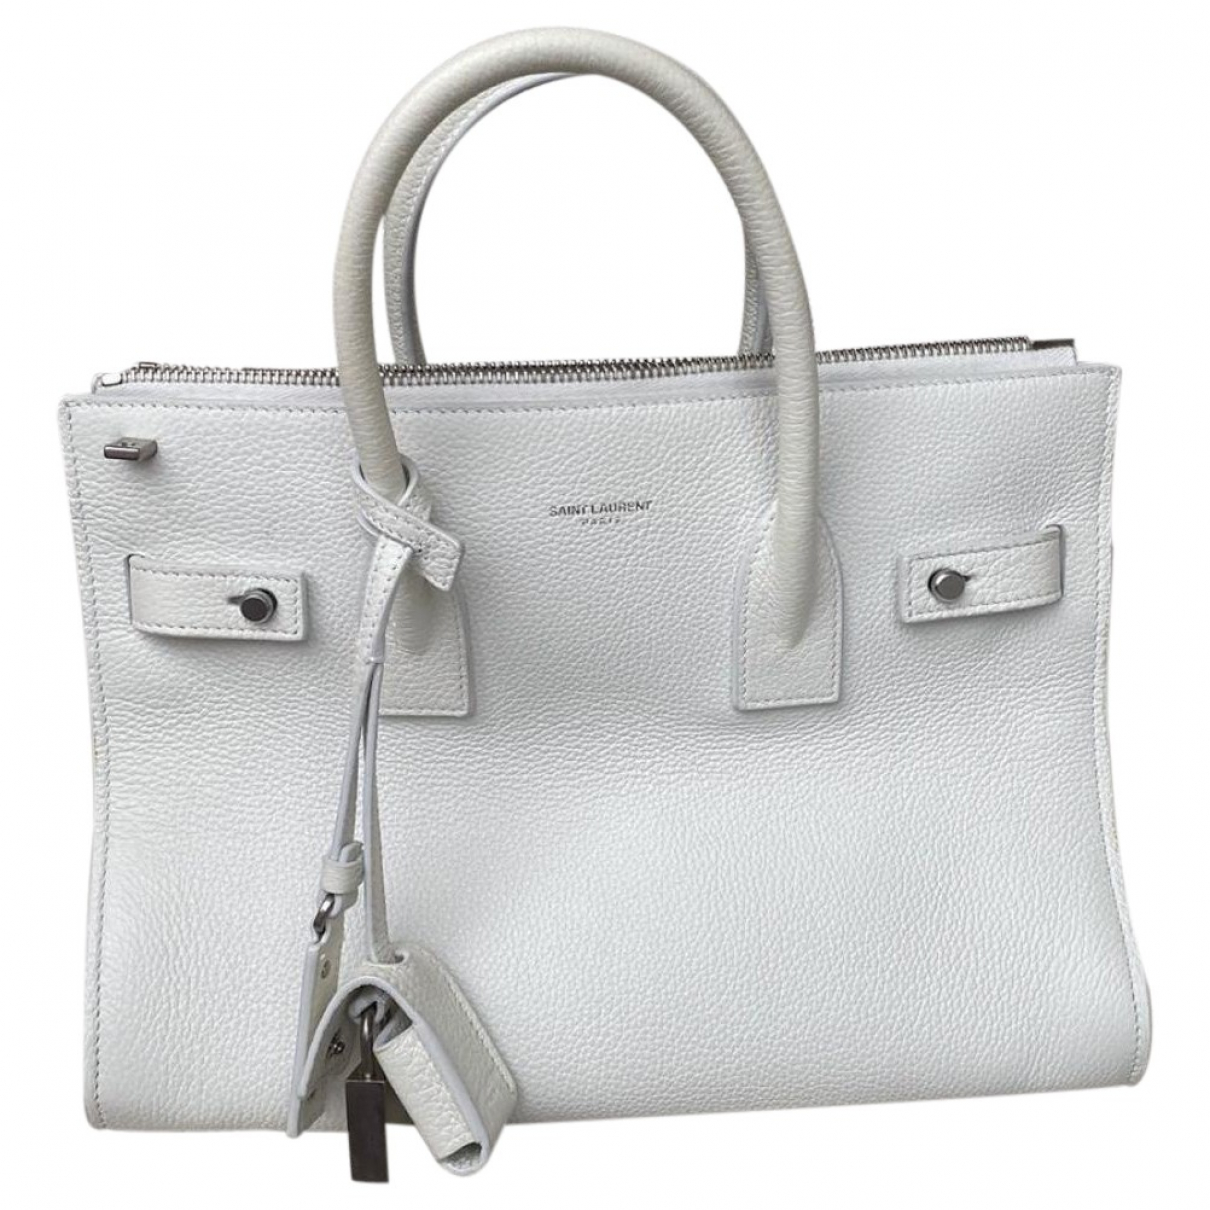 Saint Laurent Sac de Jour White Leather handbag for Women \N